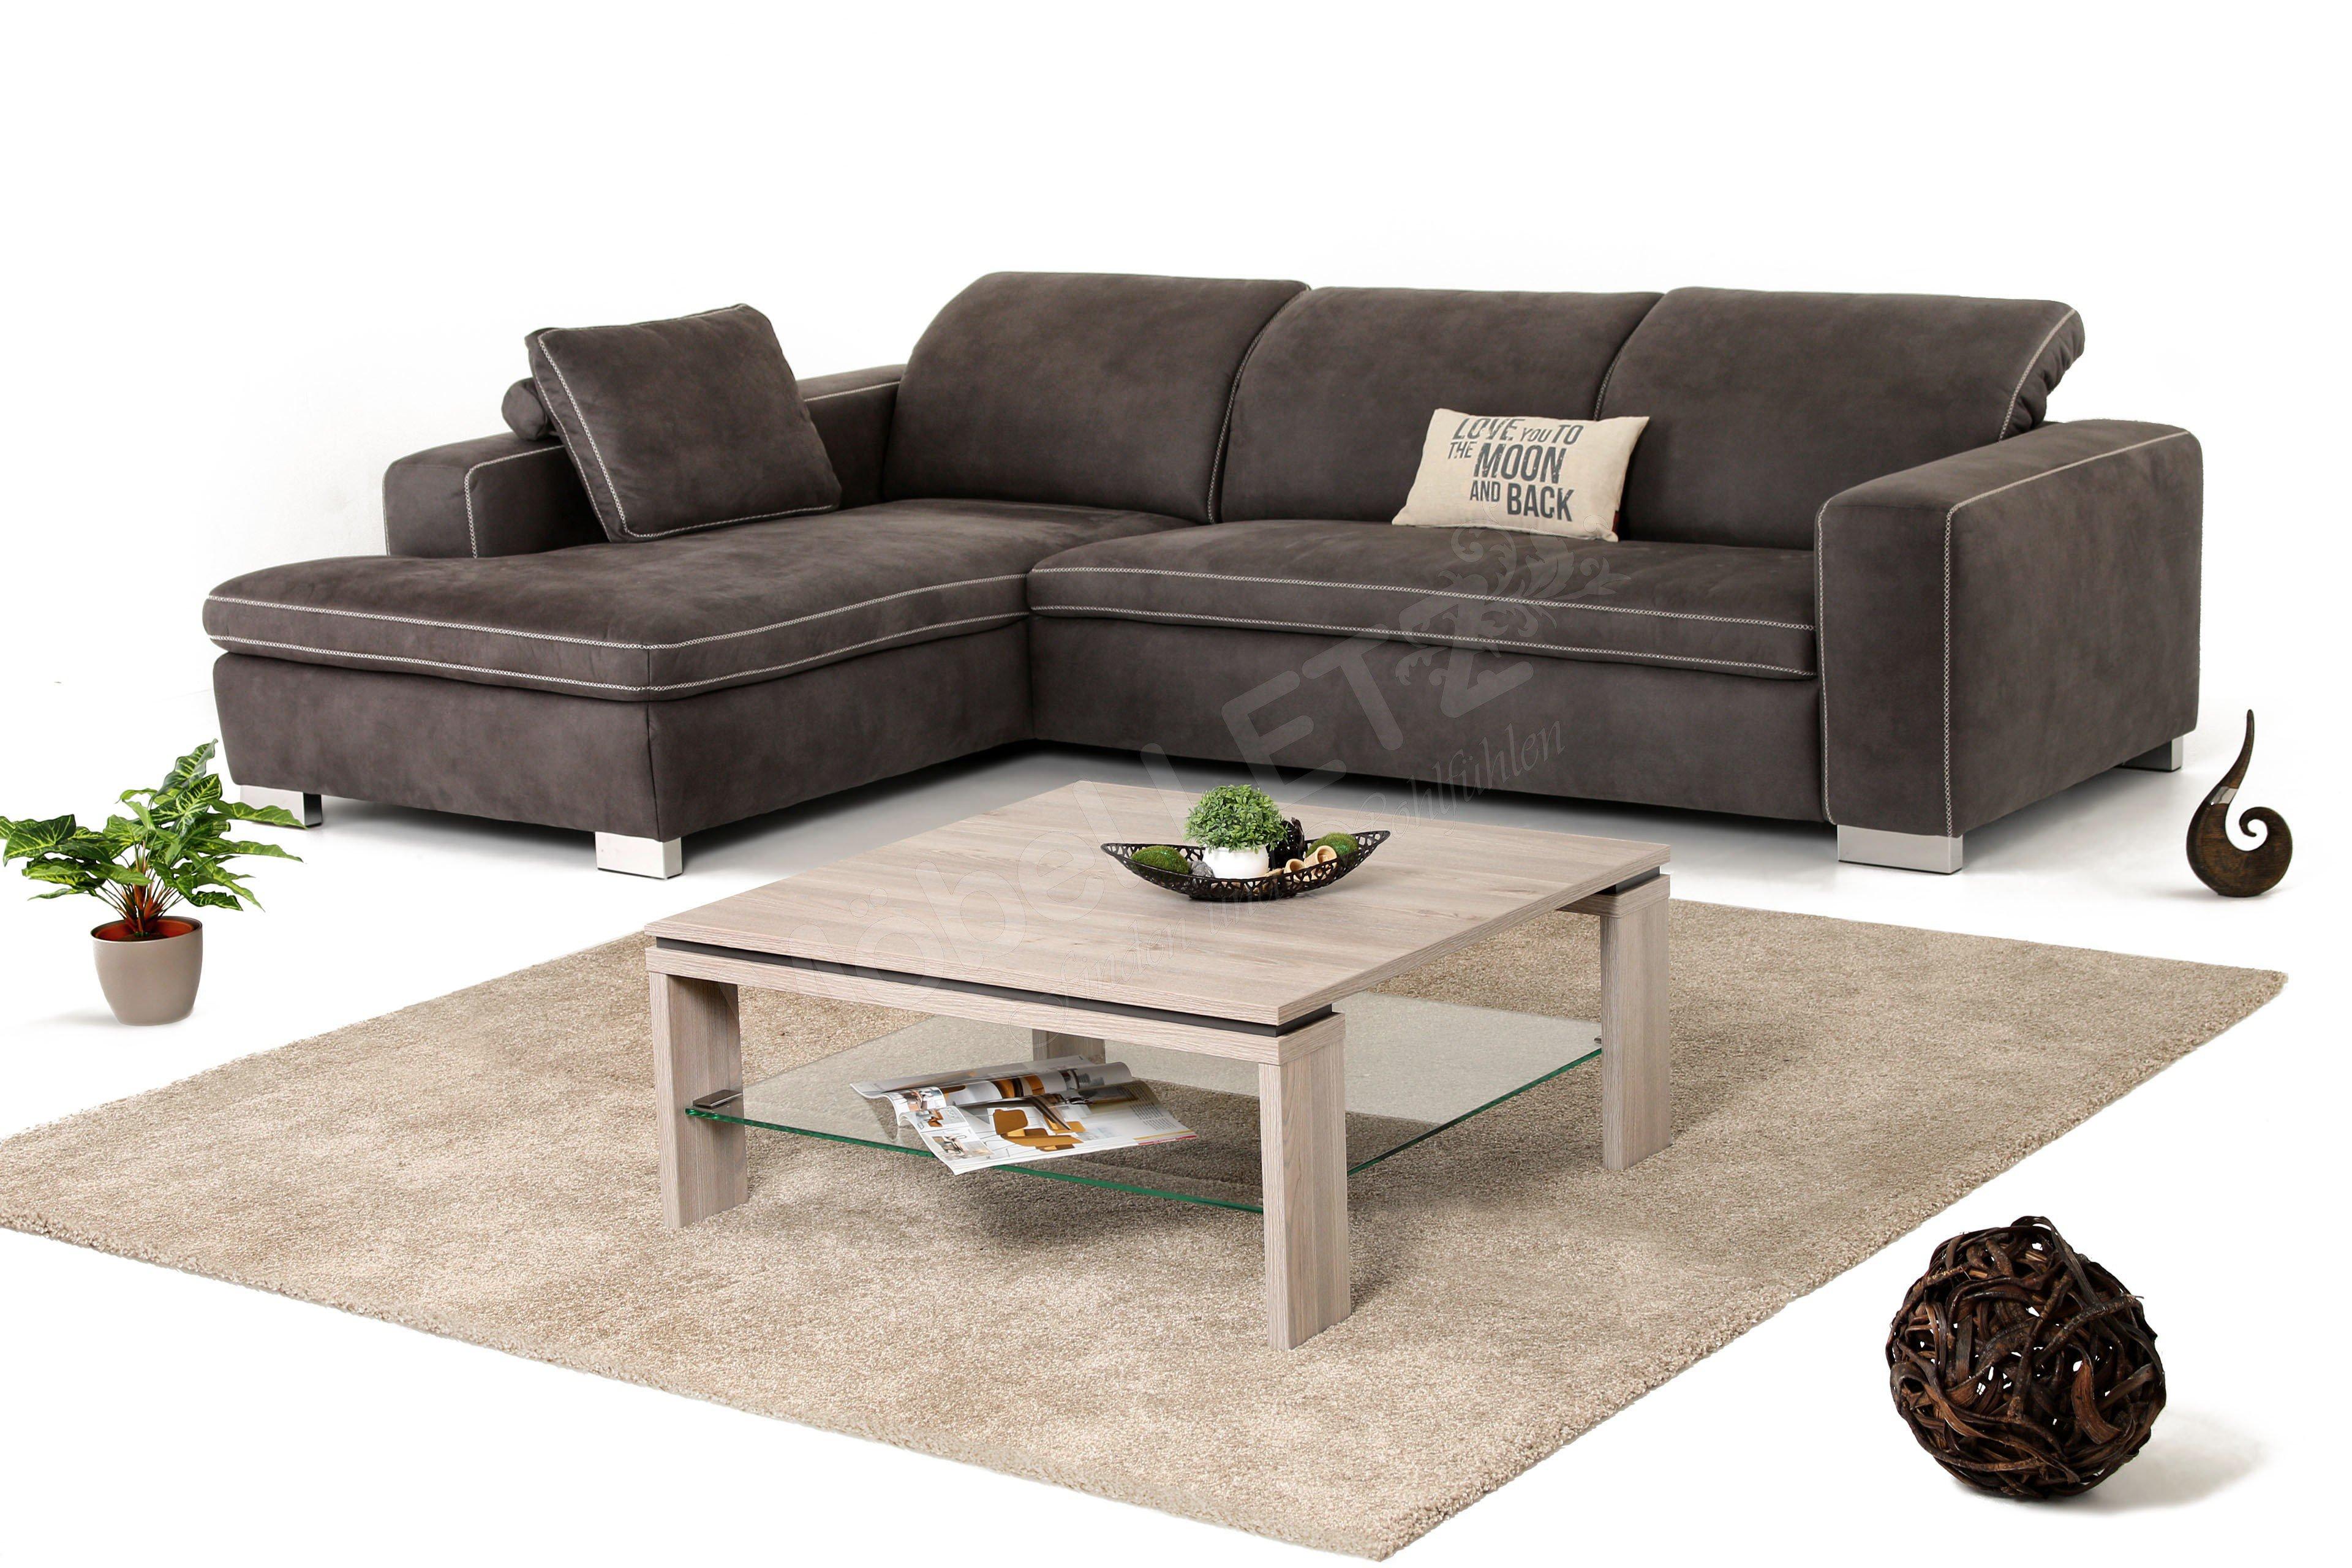 Candy Lakewood Sofa in Grau | Möbel Letz - Ihr Online-Shop